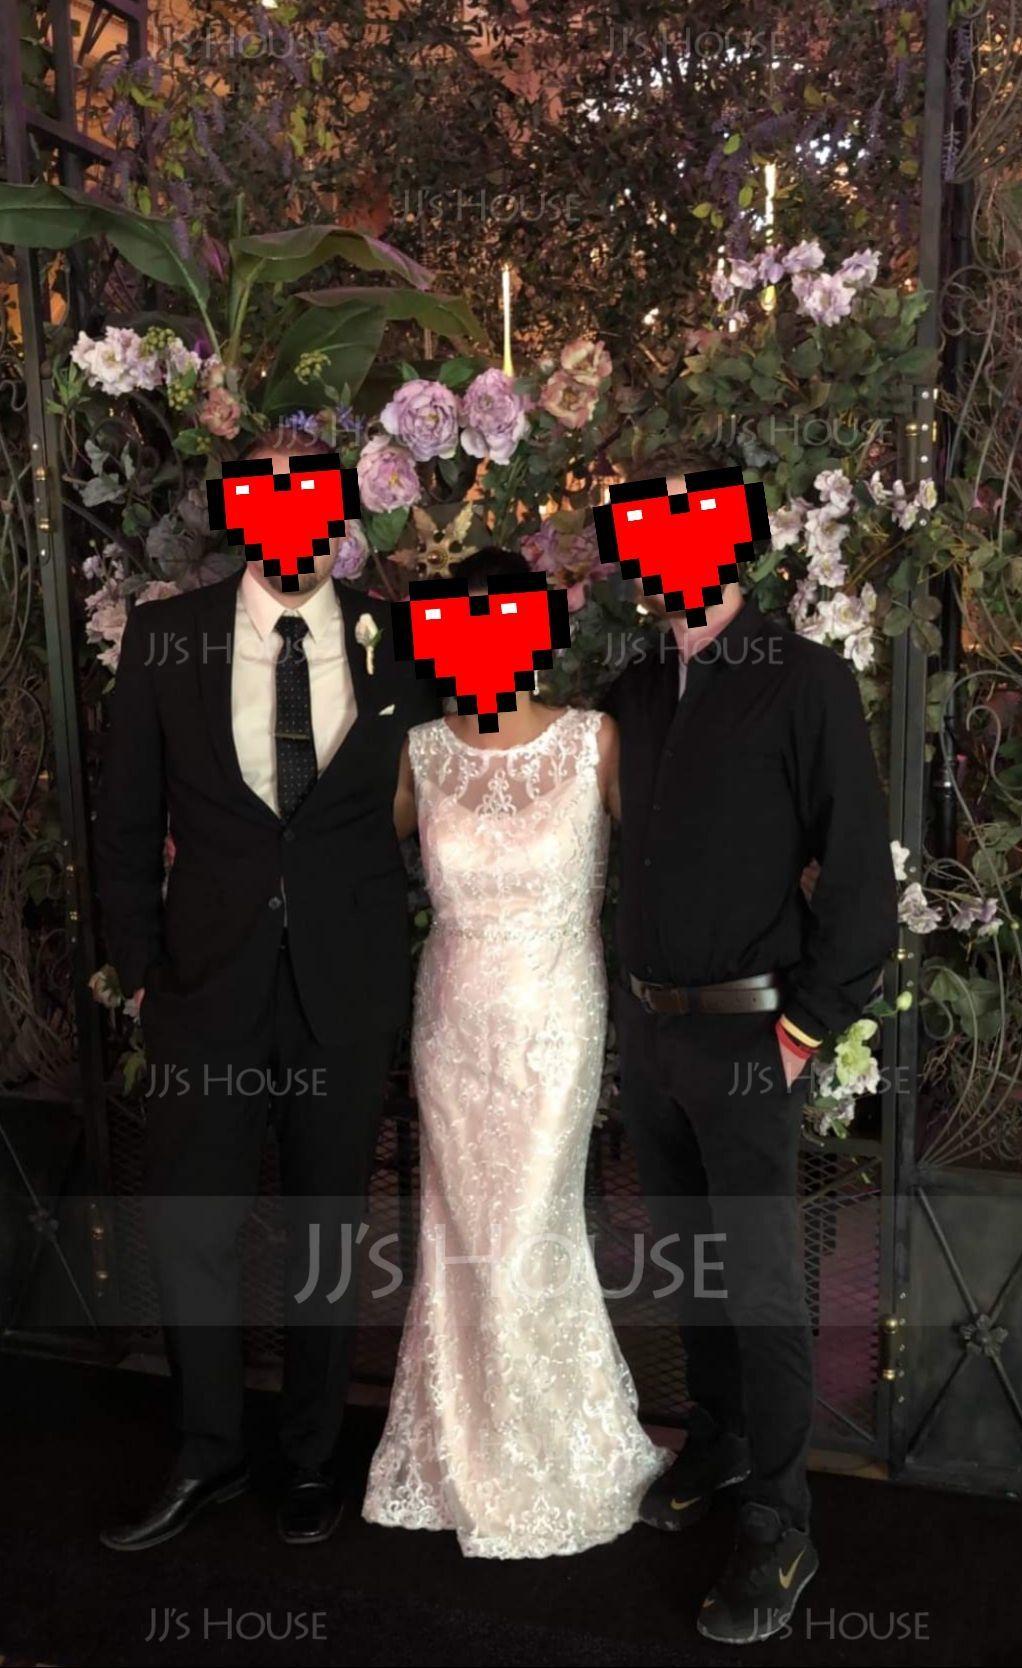 Sheath/Column Scoop Neck Floor-Length Lace Wedding Dress With Beading (002118443)